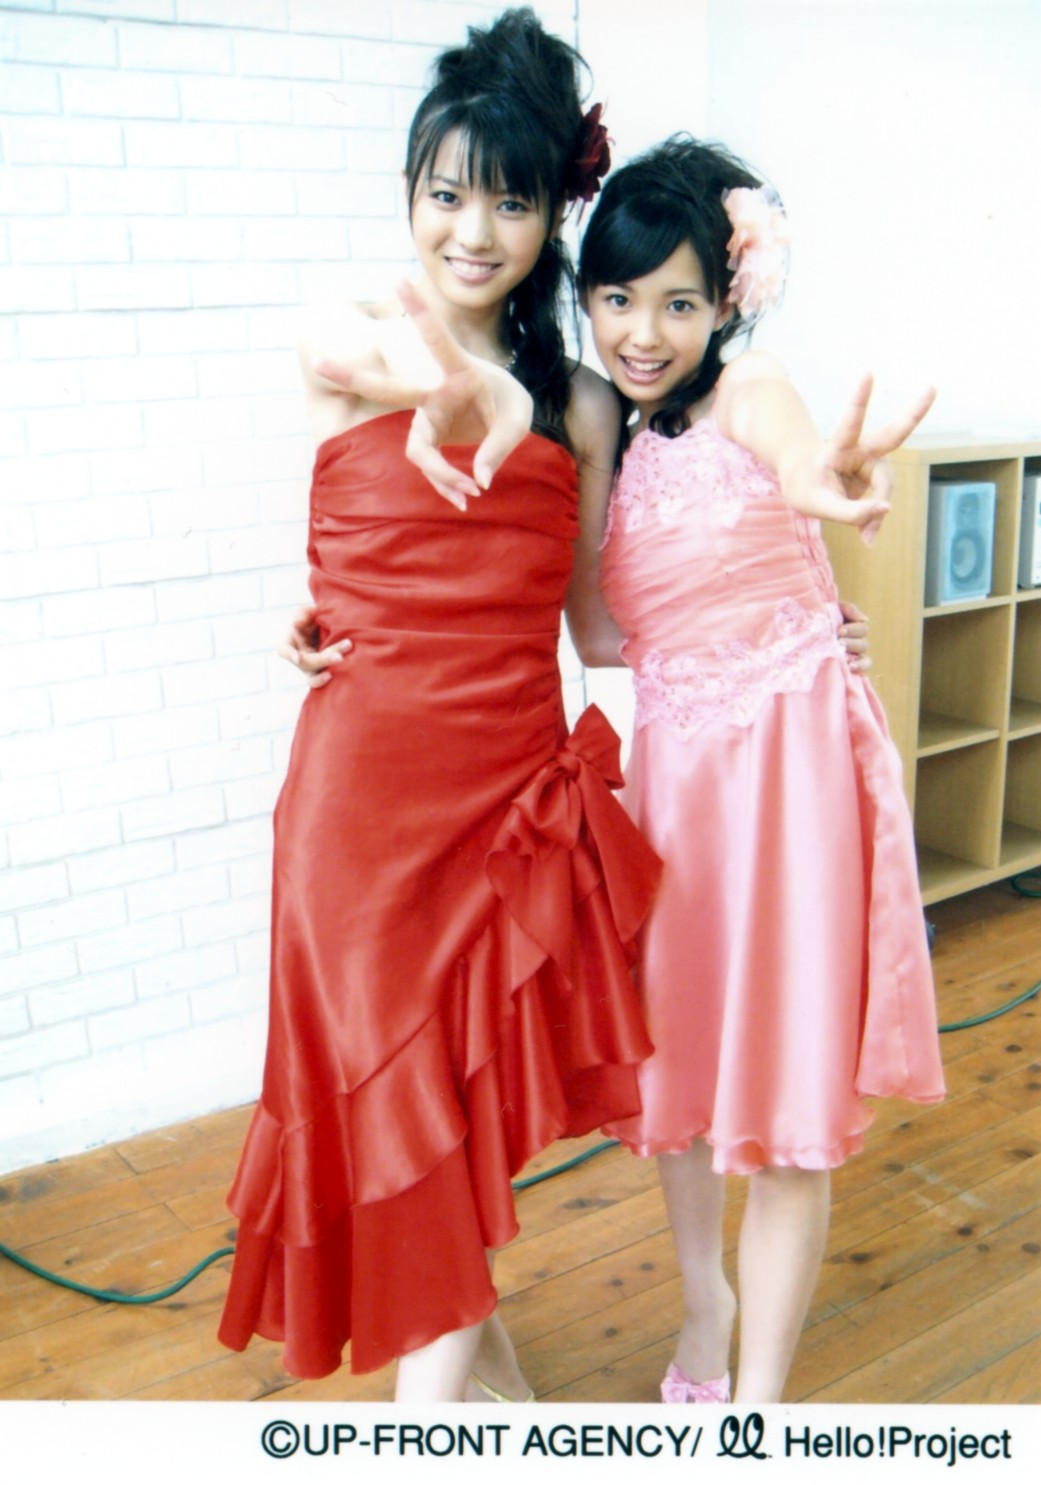 PINKのドレスの中島早貴 赤のドレスの矢島舞美 071207オフショット①